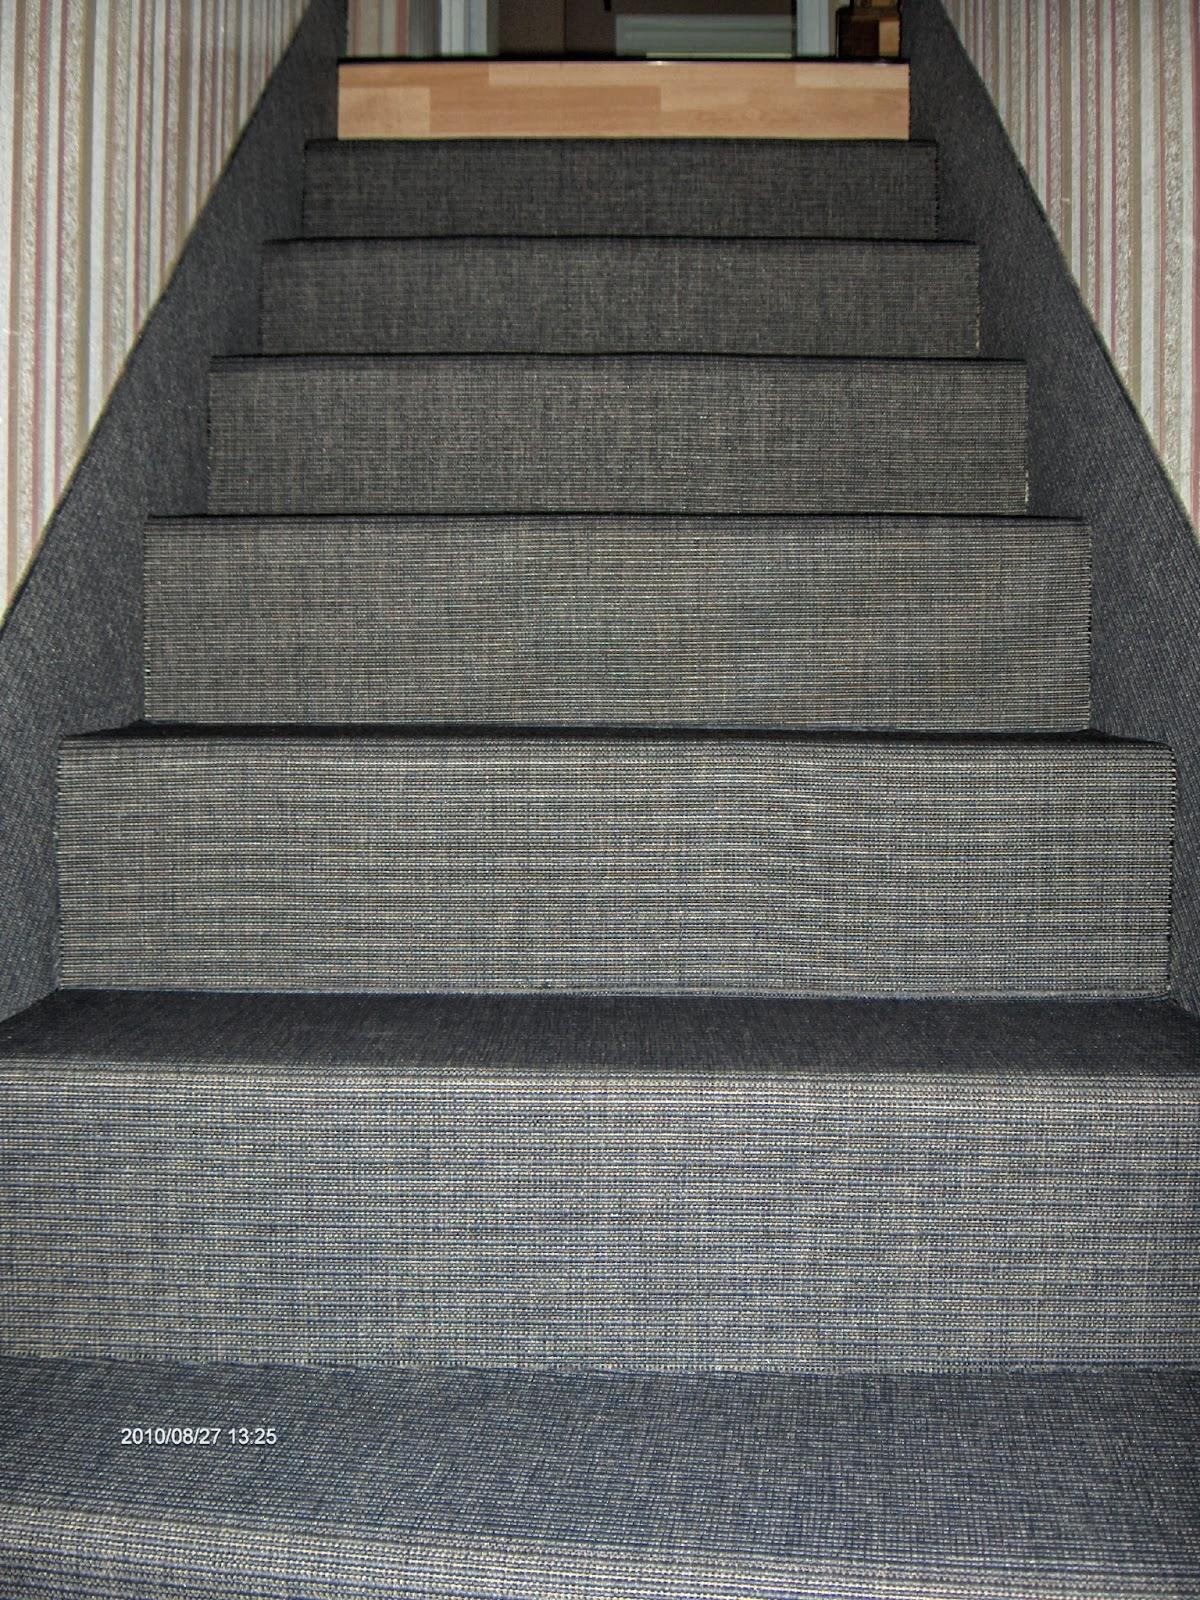 habiller un escalier bois. Black Bedroom Furniture Sets. Home Design Ideas